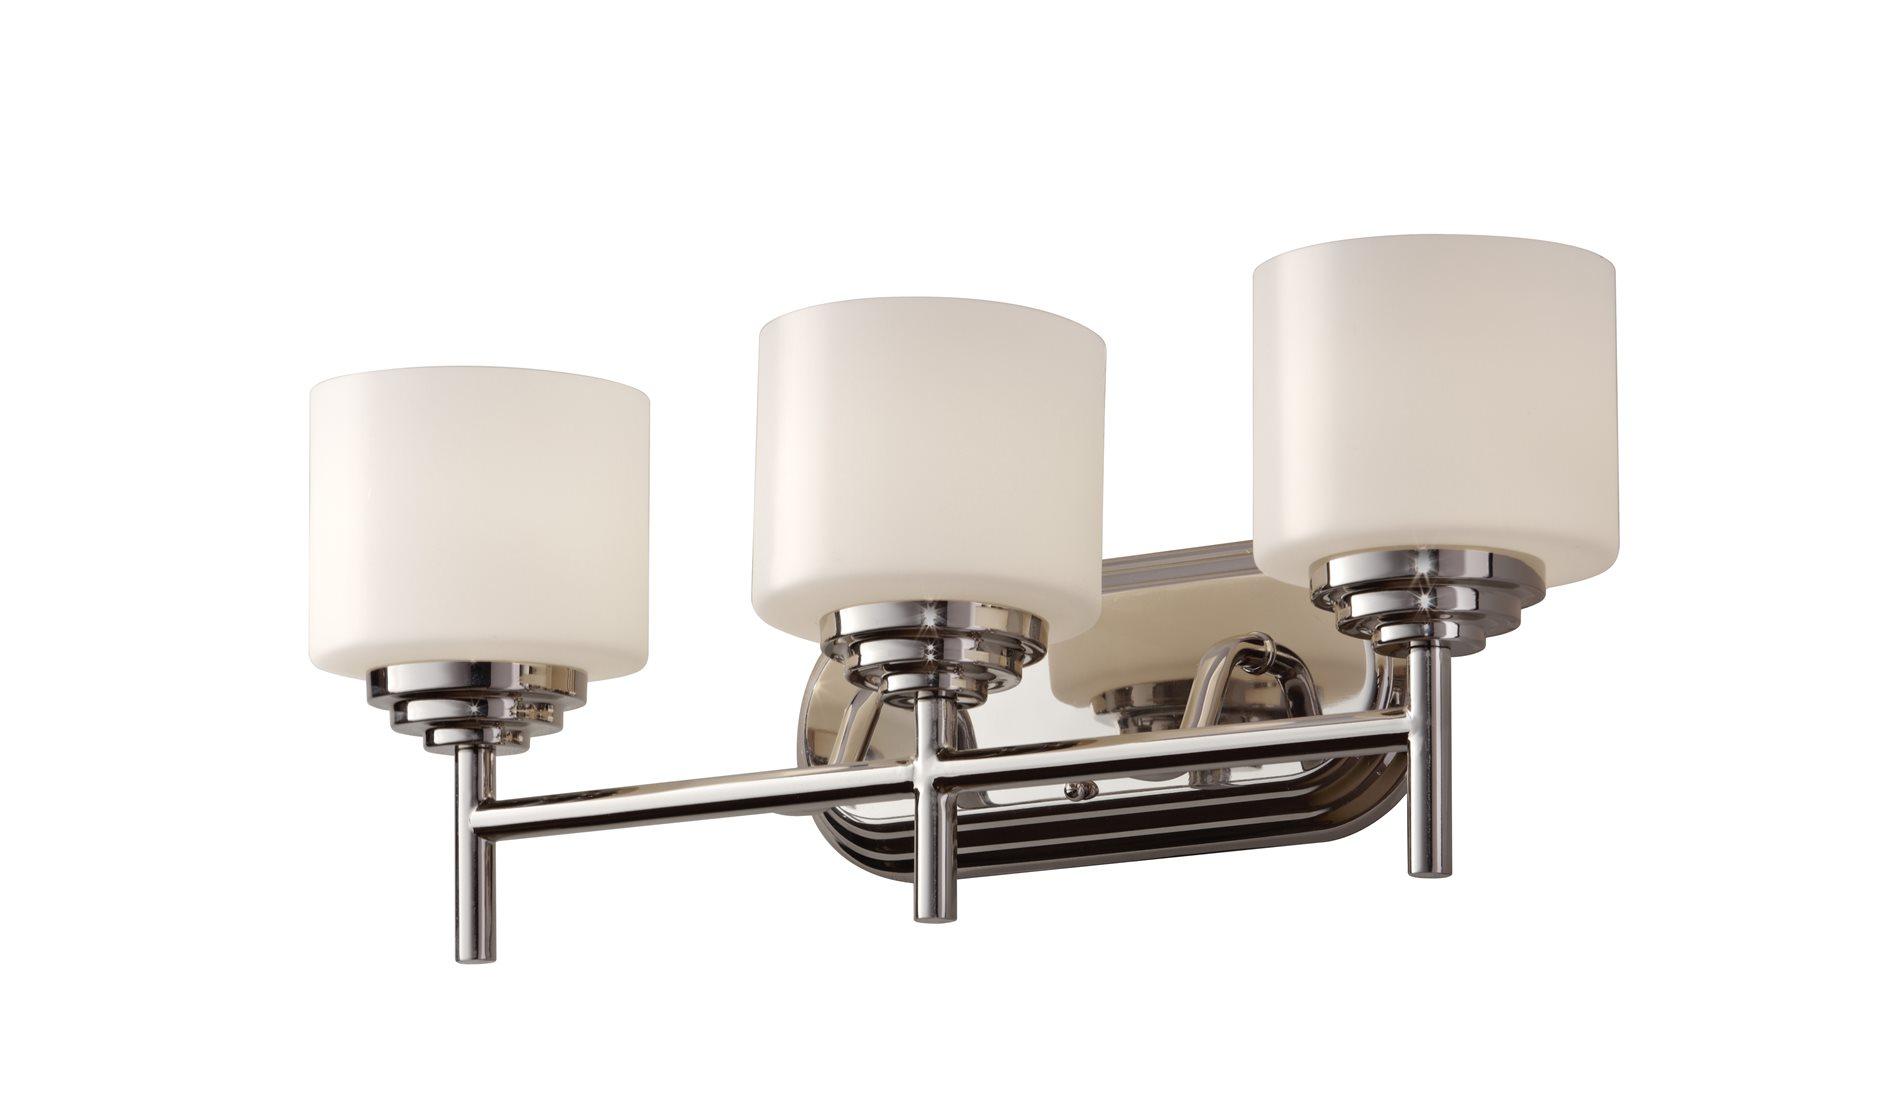 murray feiss malibu transitional bathroom vanity light mrf vs26003. Black Bedroom Furniture Sets. Home Design Ideas